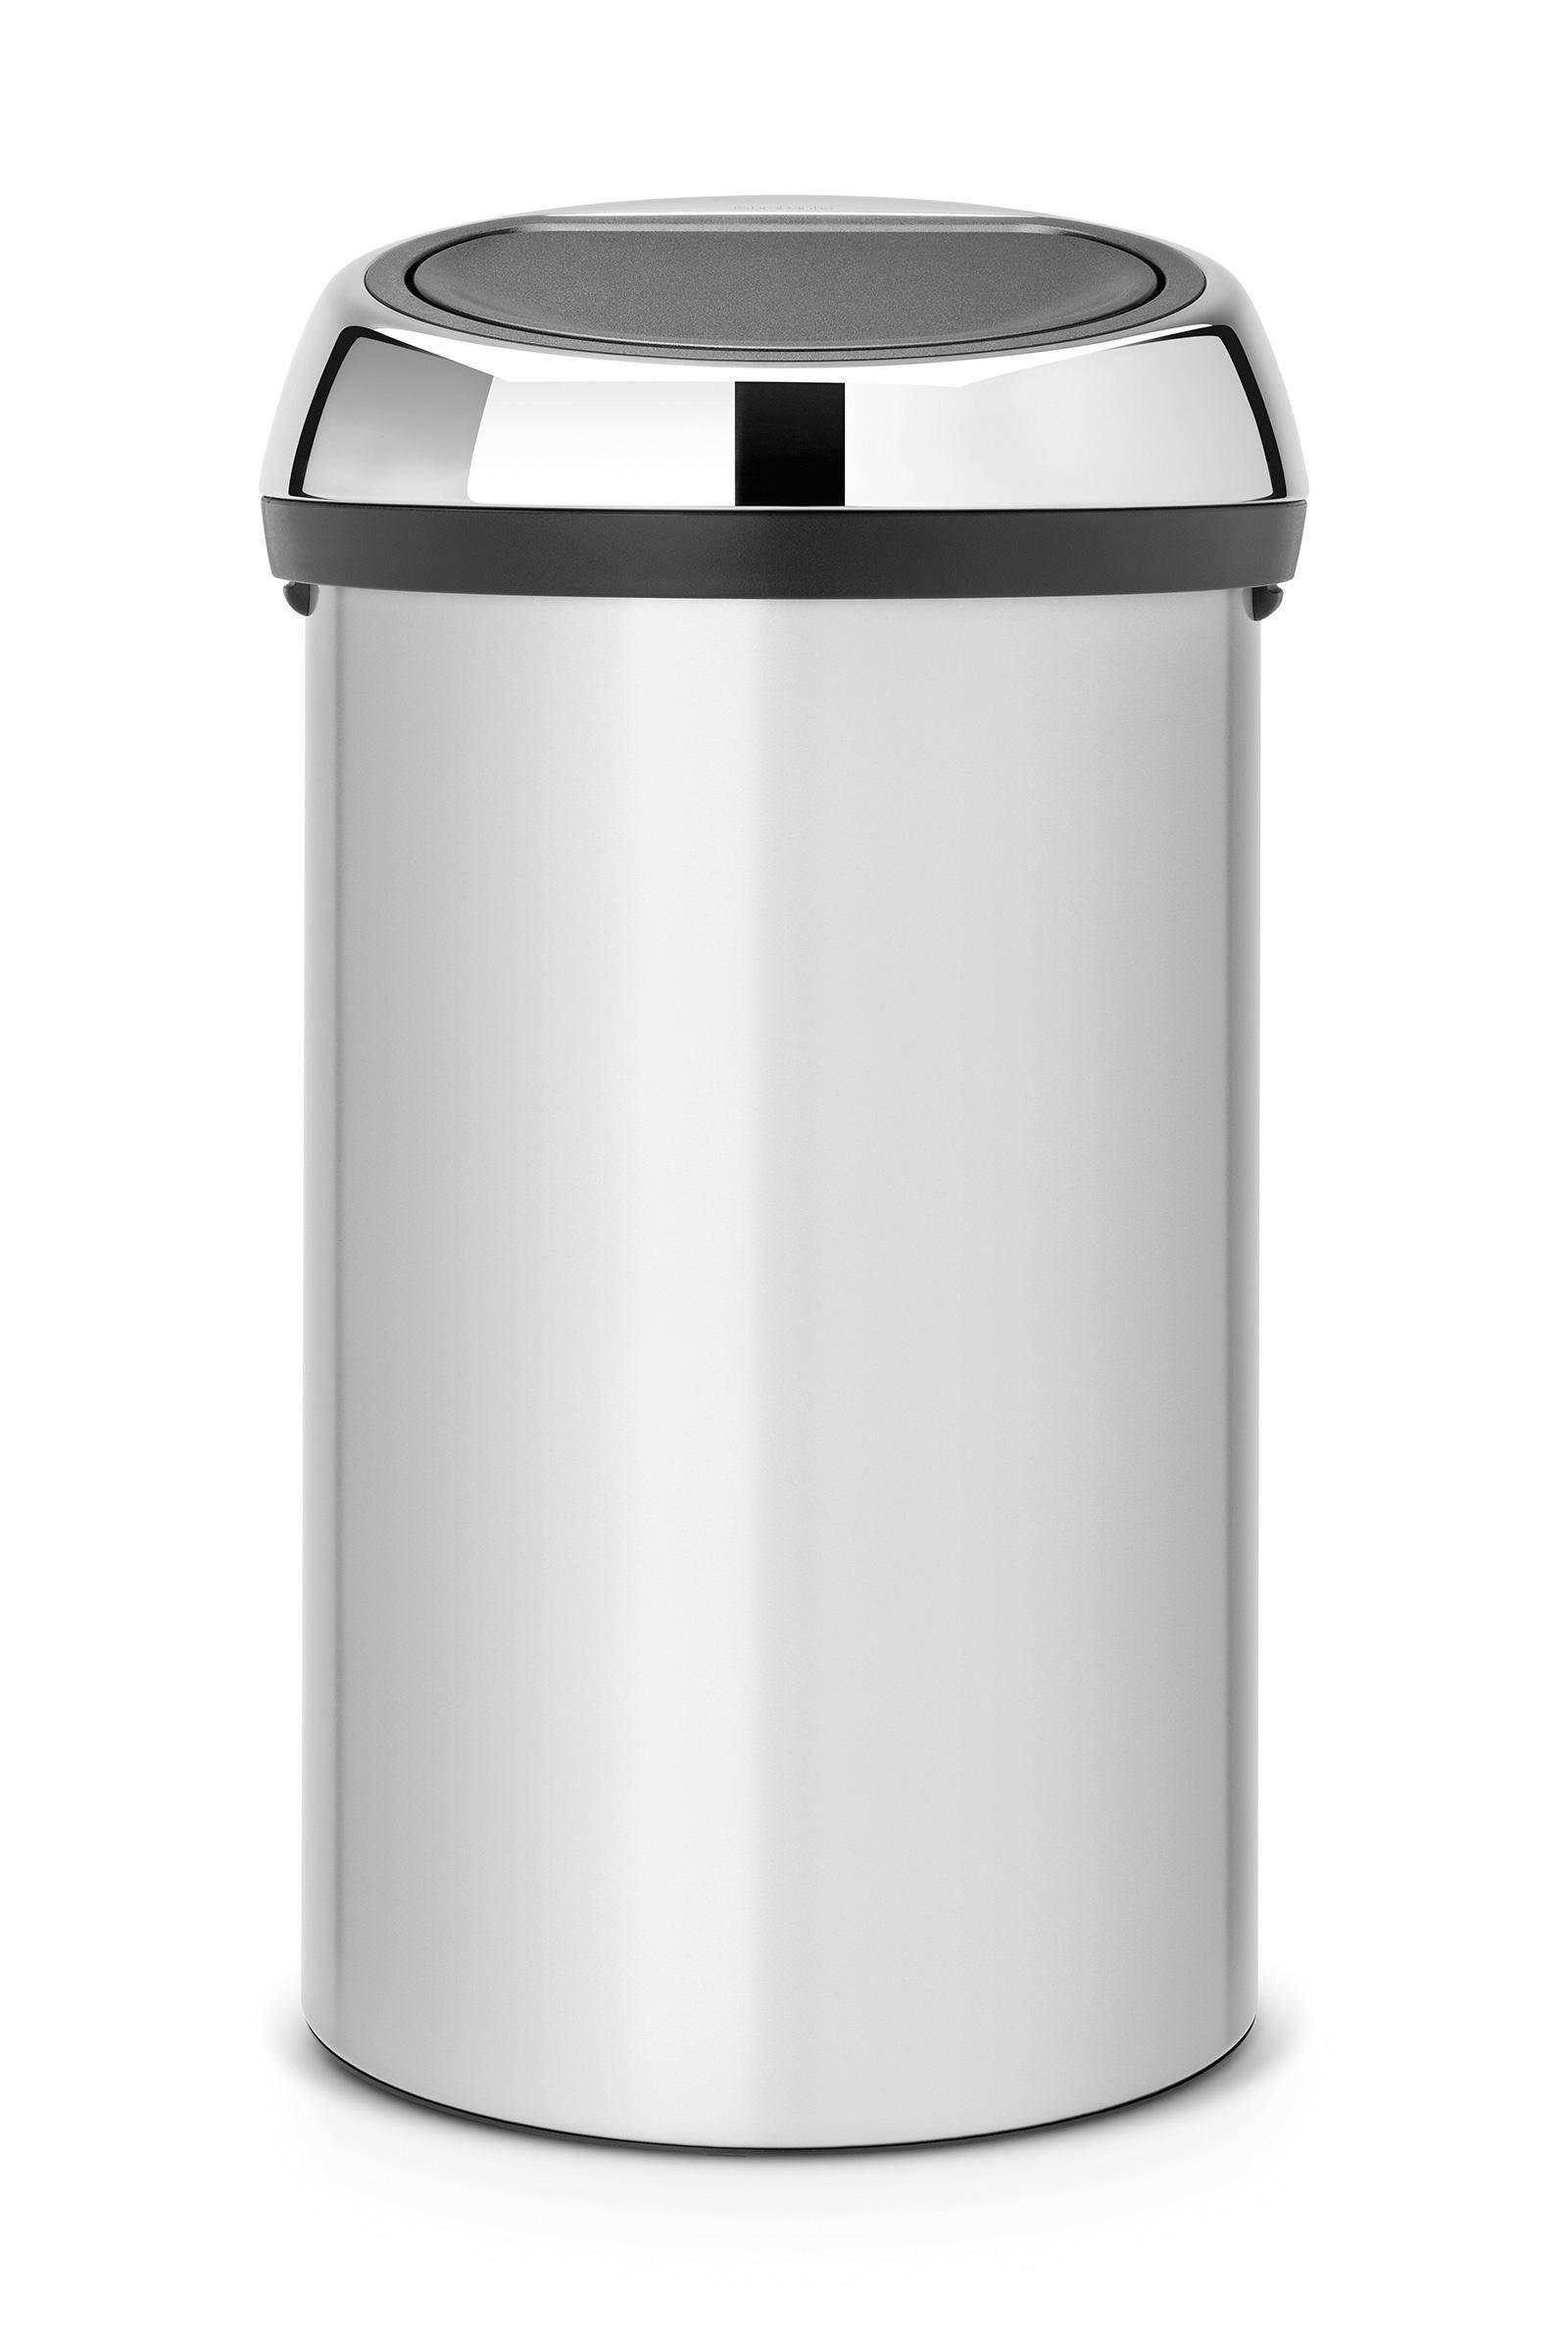 Aanbieding Brabantia Touch Bin 30 Ltr.Brabantia Touch Bin 60 Liter Prullenbak Wehkamp